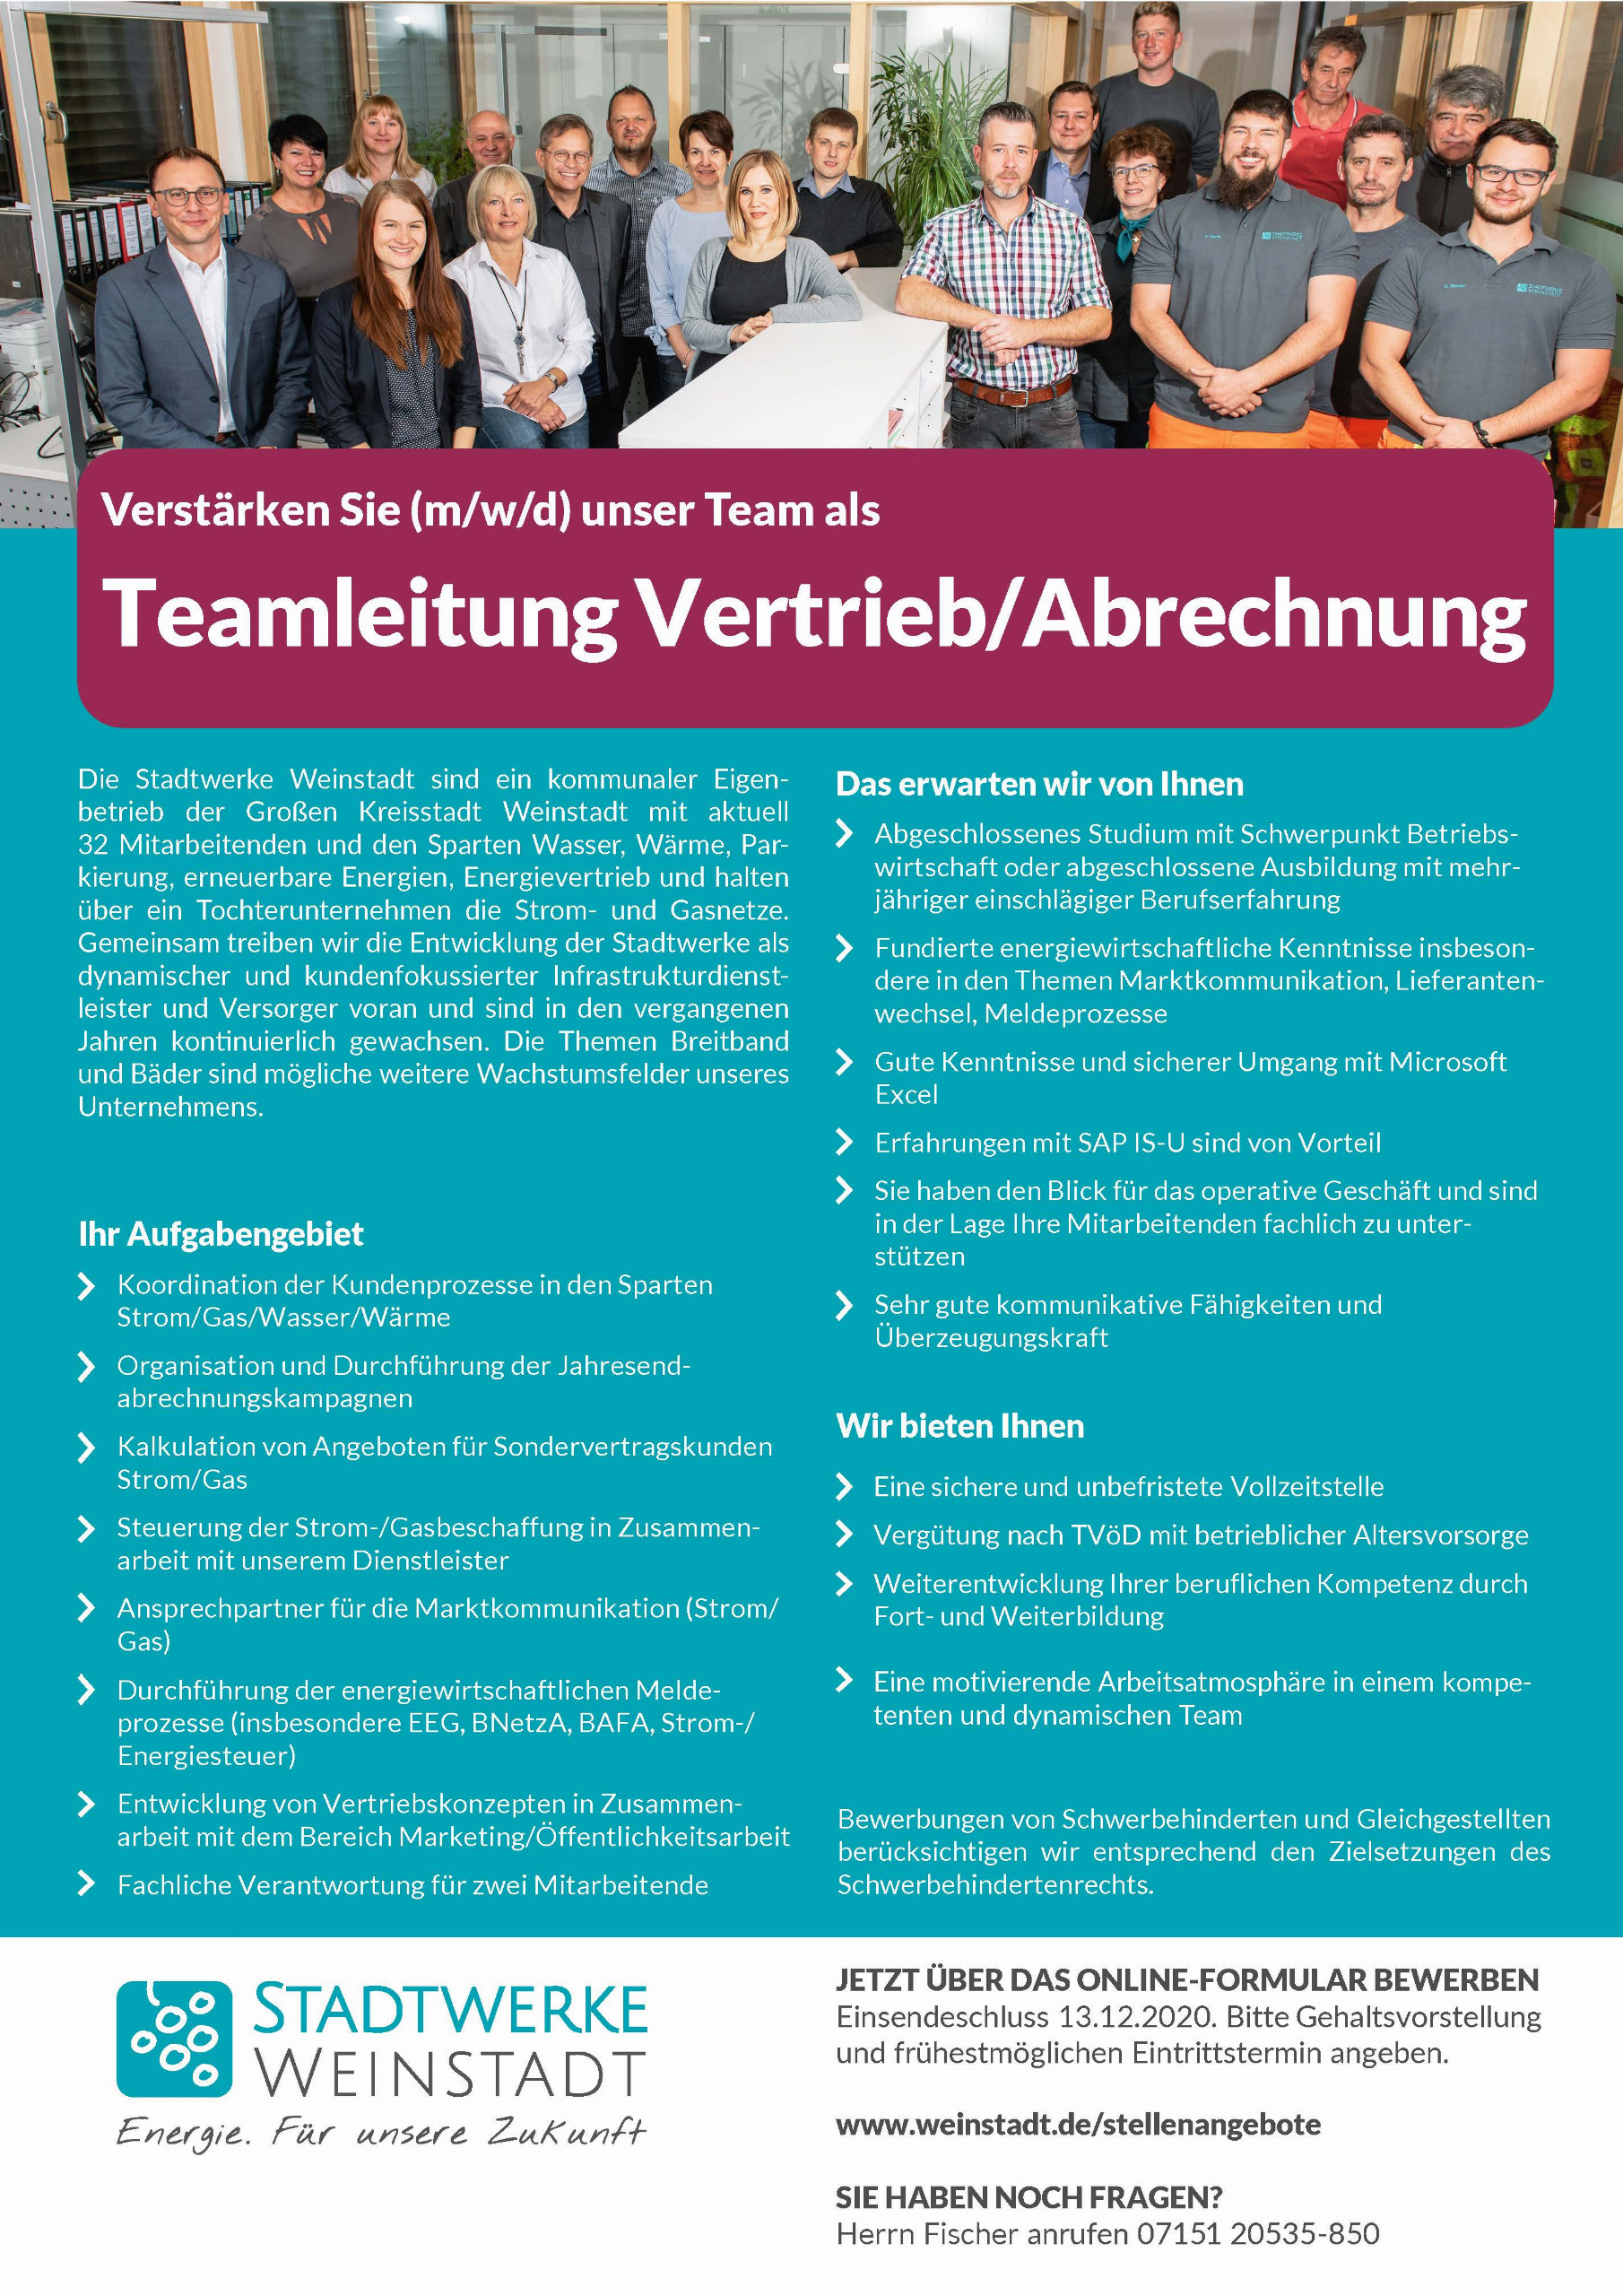 2020-11-12 Teamleitung Vertrieb Abrechnung_A4 (2).jpg